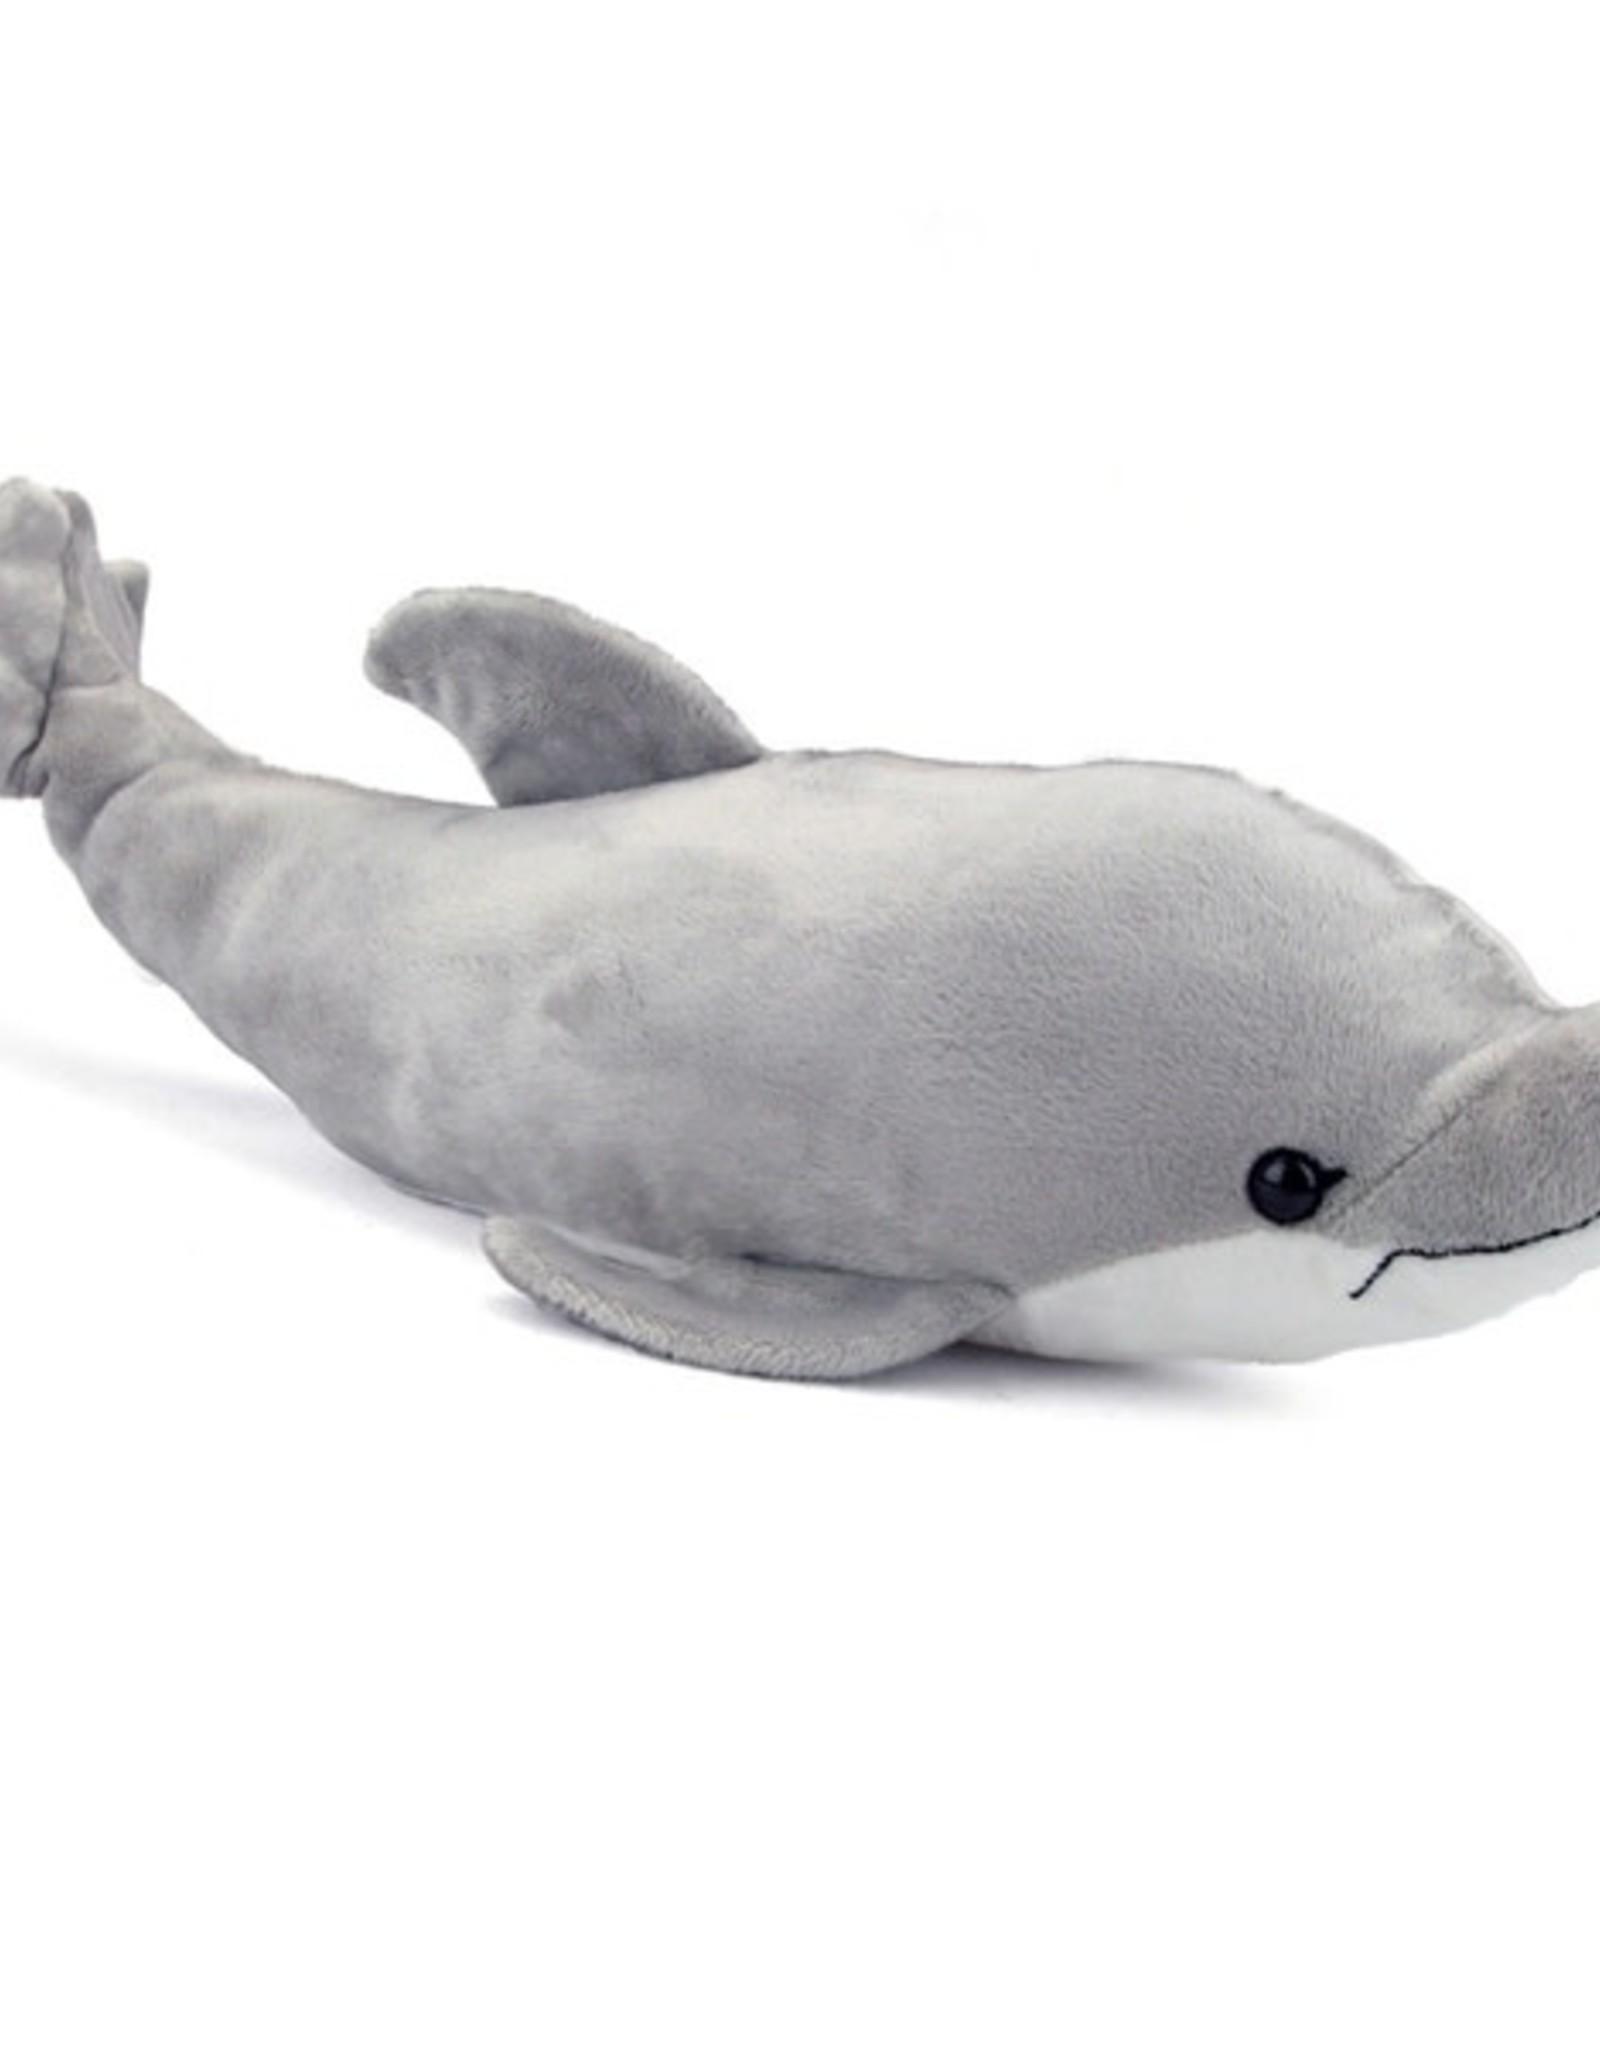 Conservation Critters Conservation Critters Dolphin